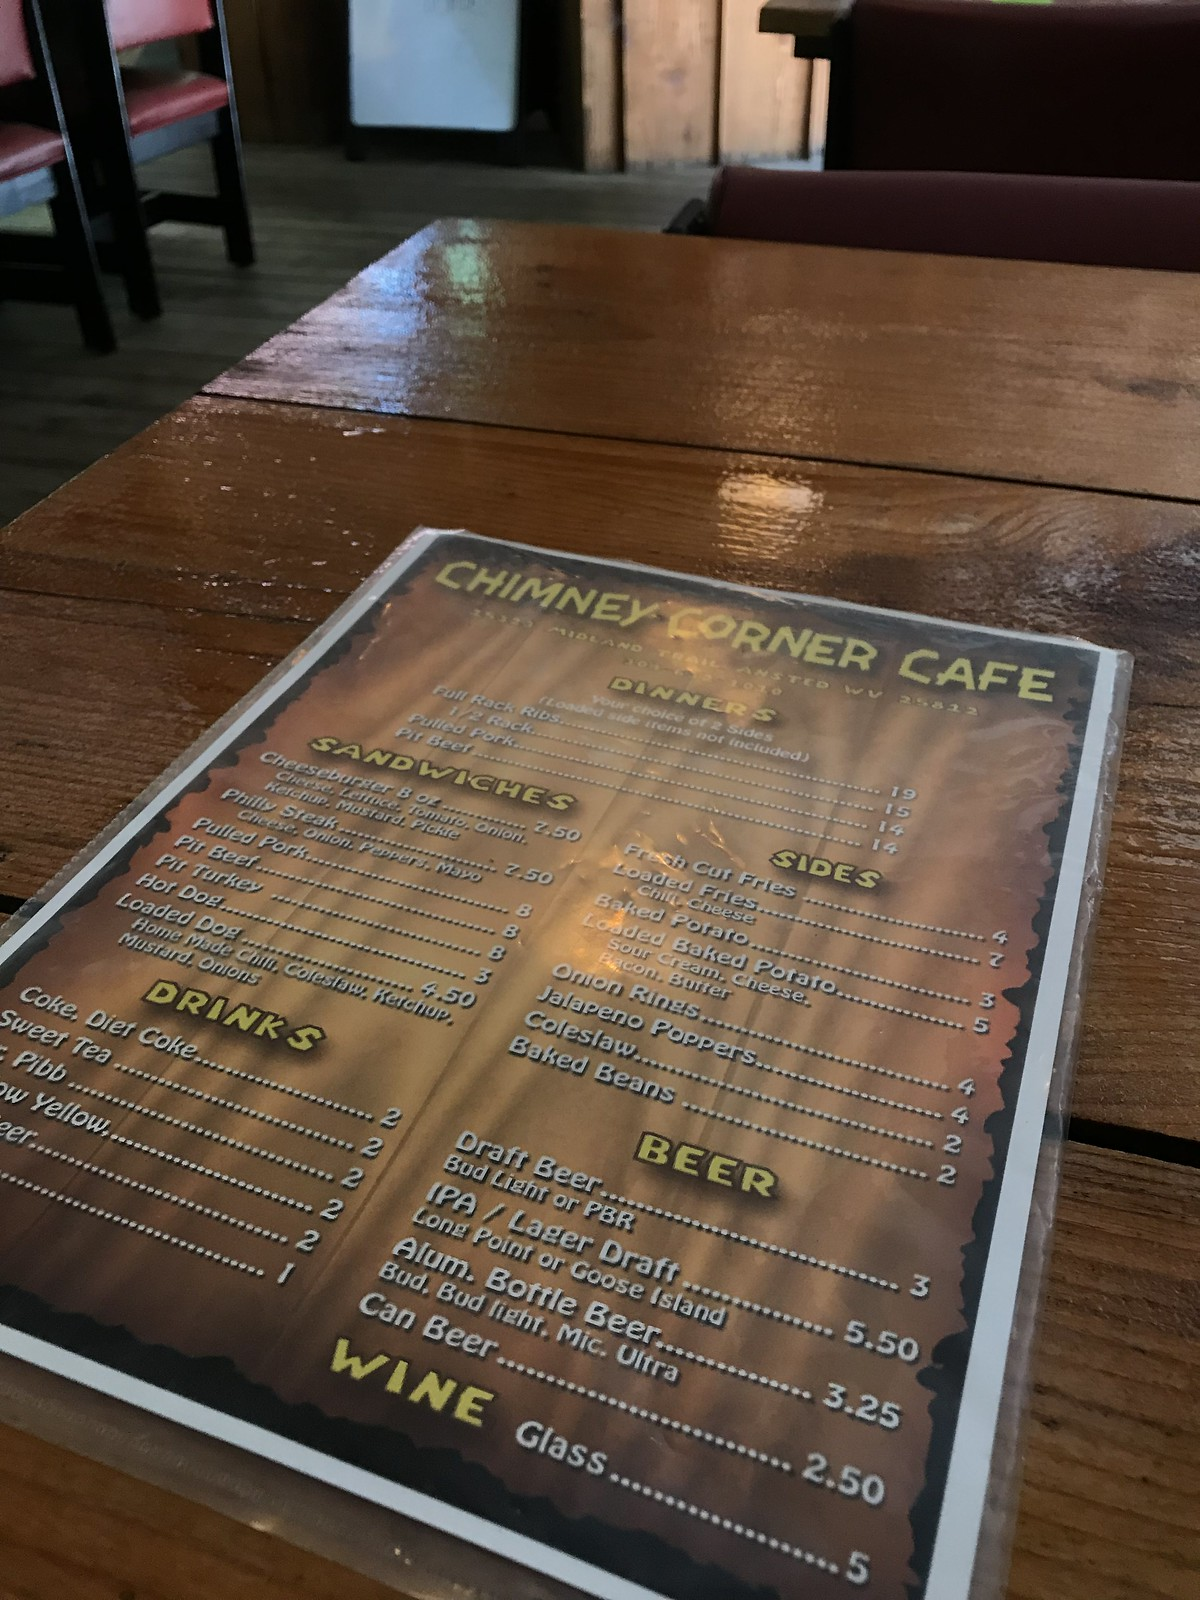 Chimney Corner Cafe